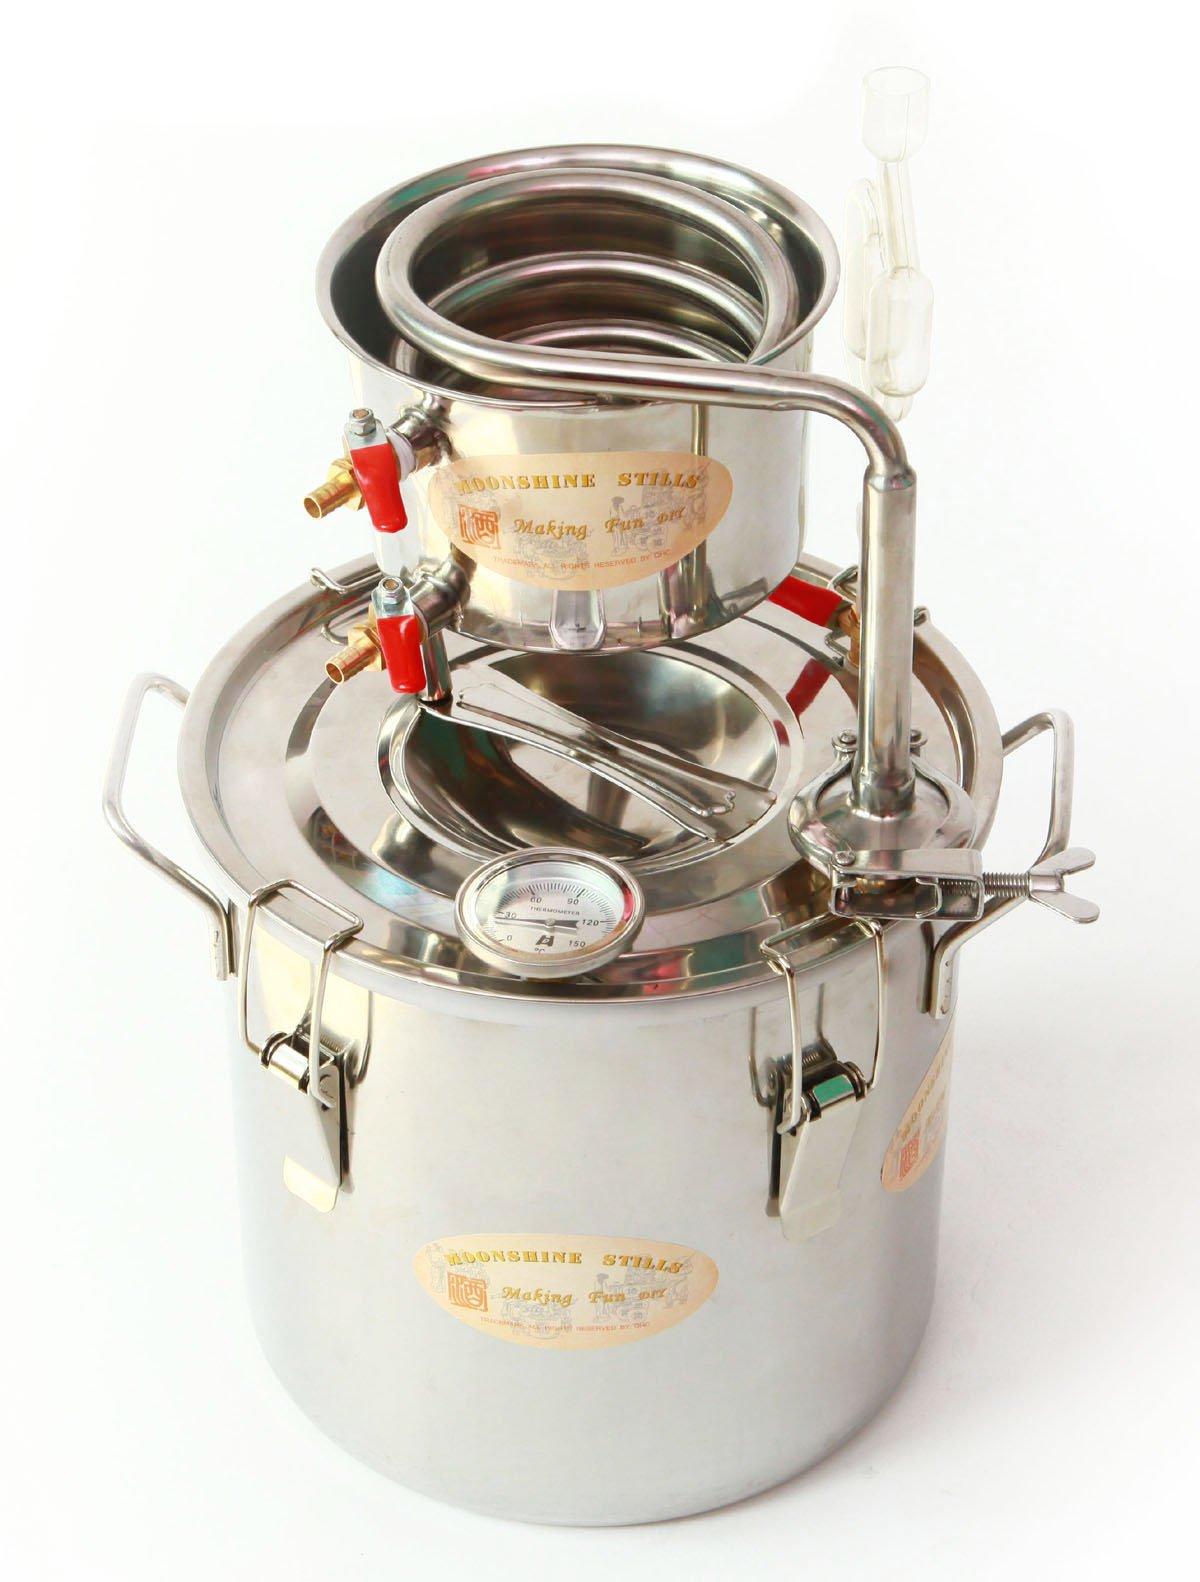 DIY 2 Gal 10 Liters Home Alcohol Whiskey Distiller Moonshine Still Stainless Steel Boiler Wine Making Kit by WMN_TRULYSTEP (Image #7)